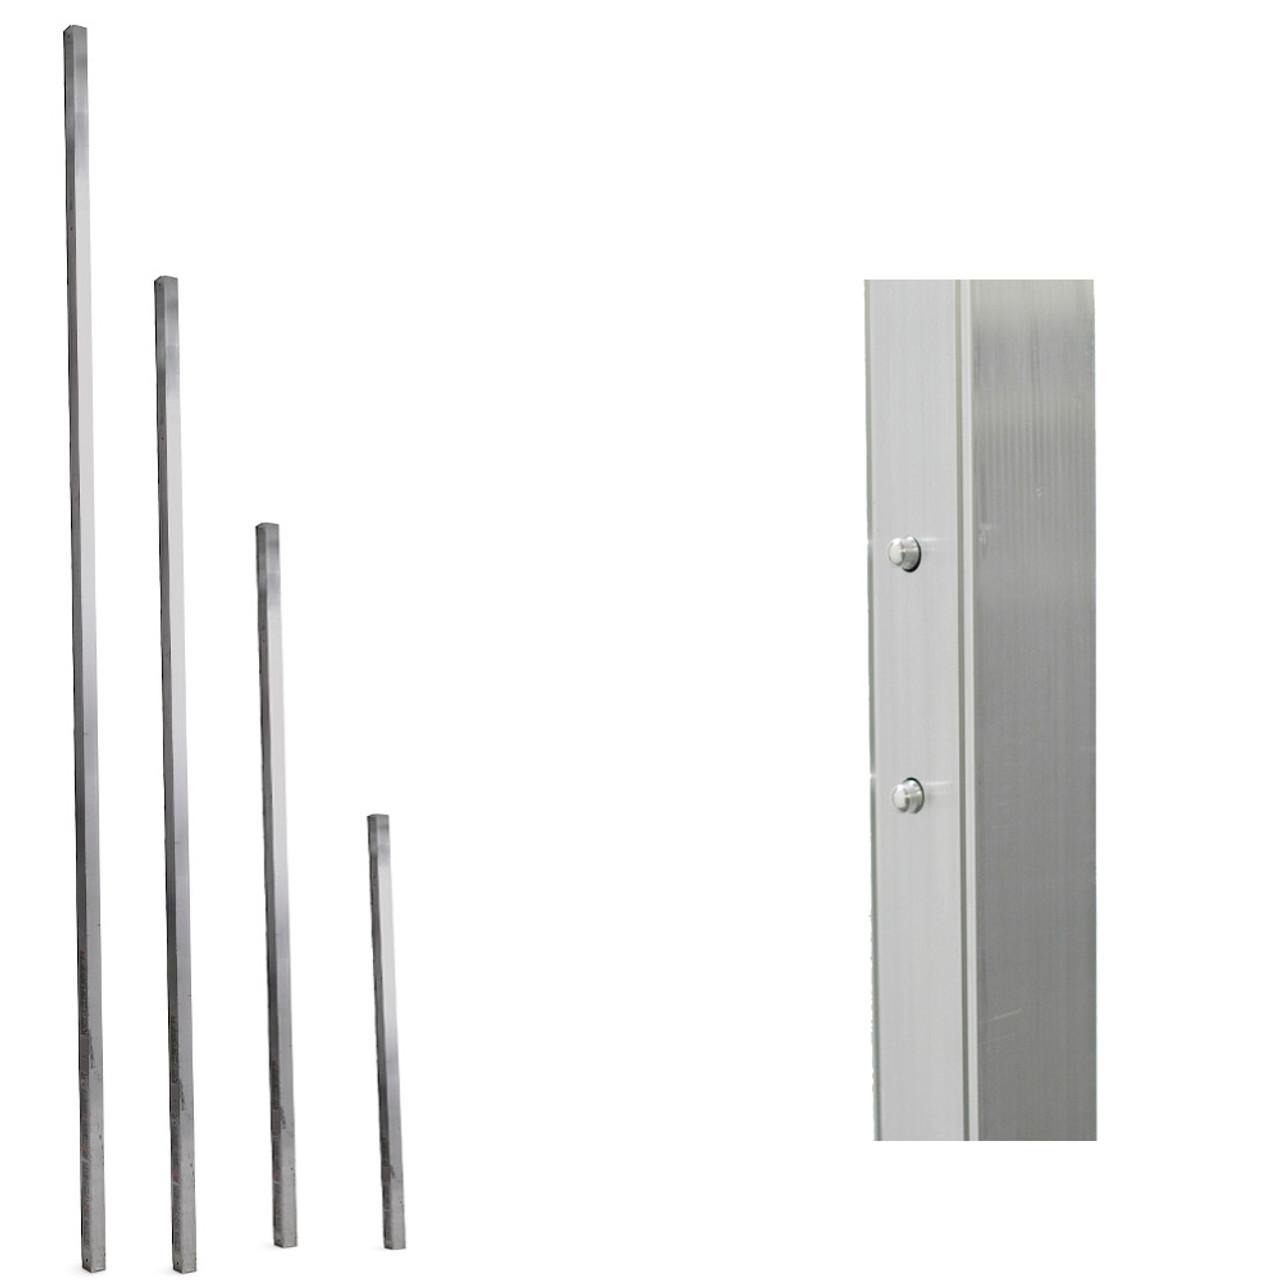 WERNER Pole Connector